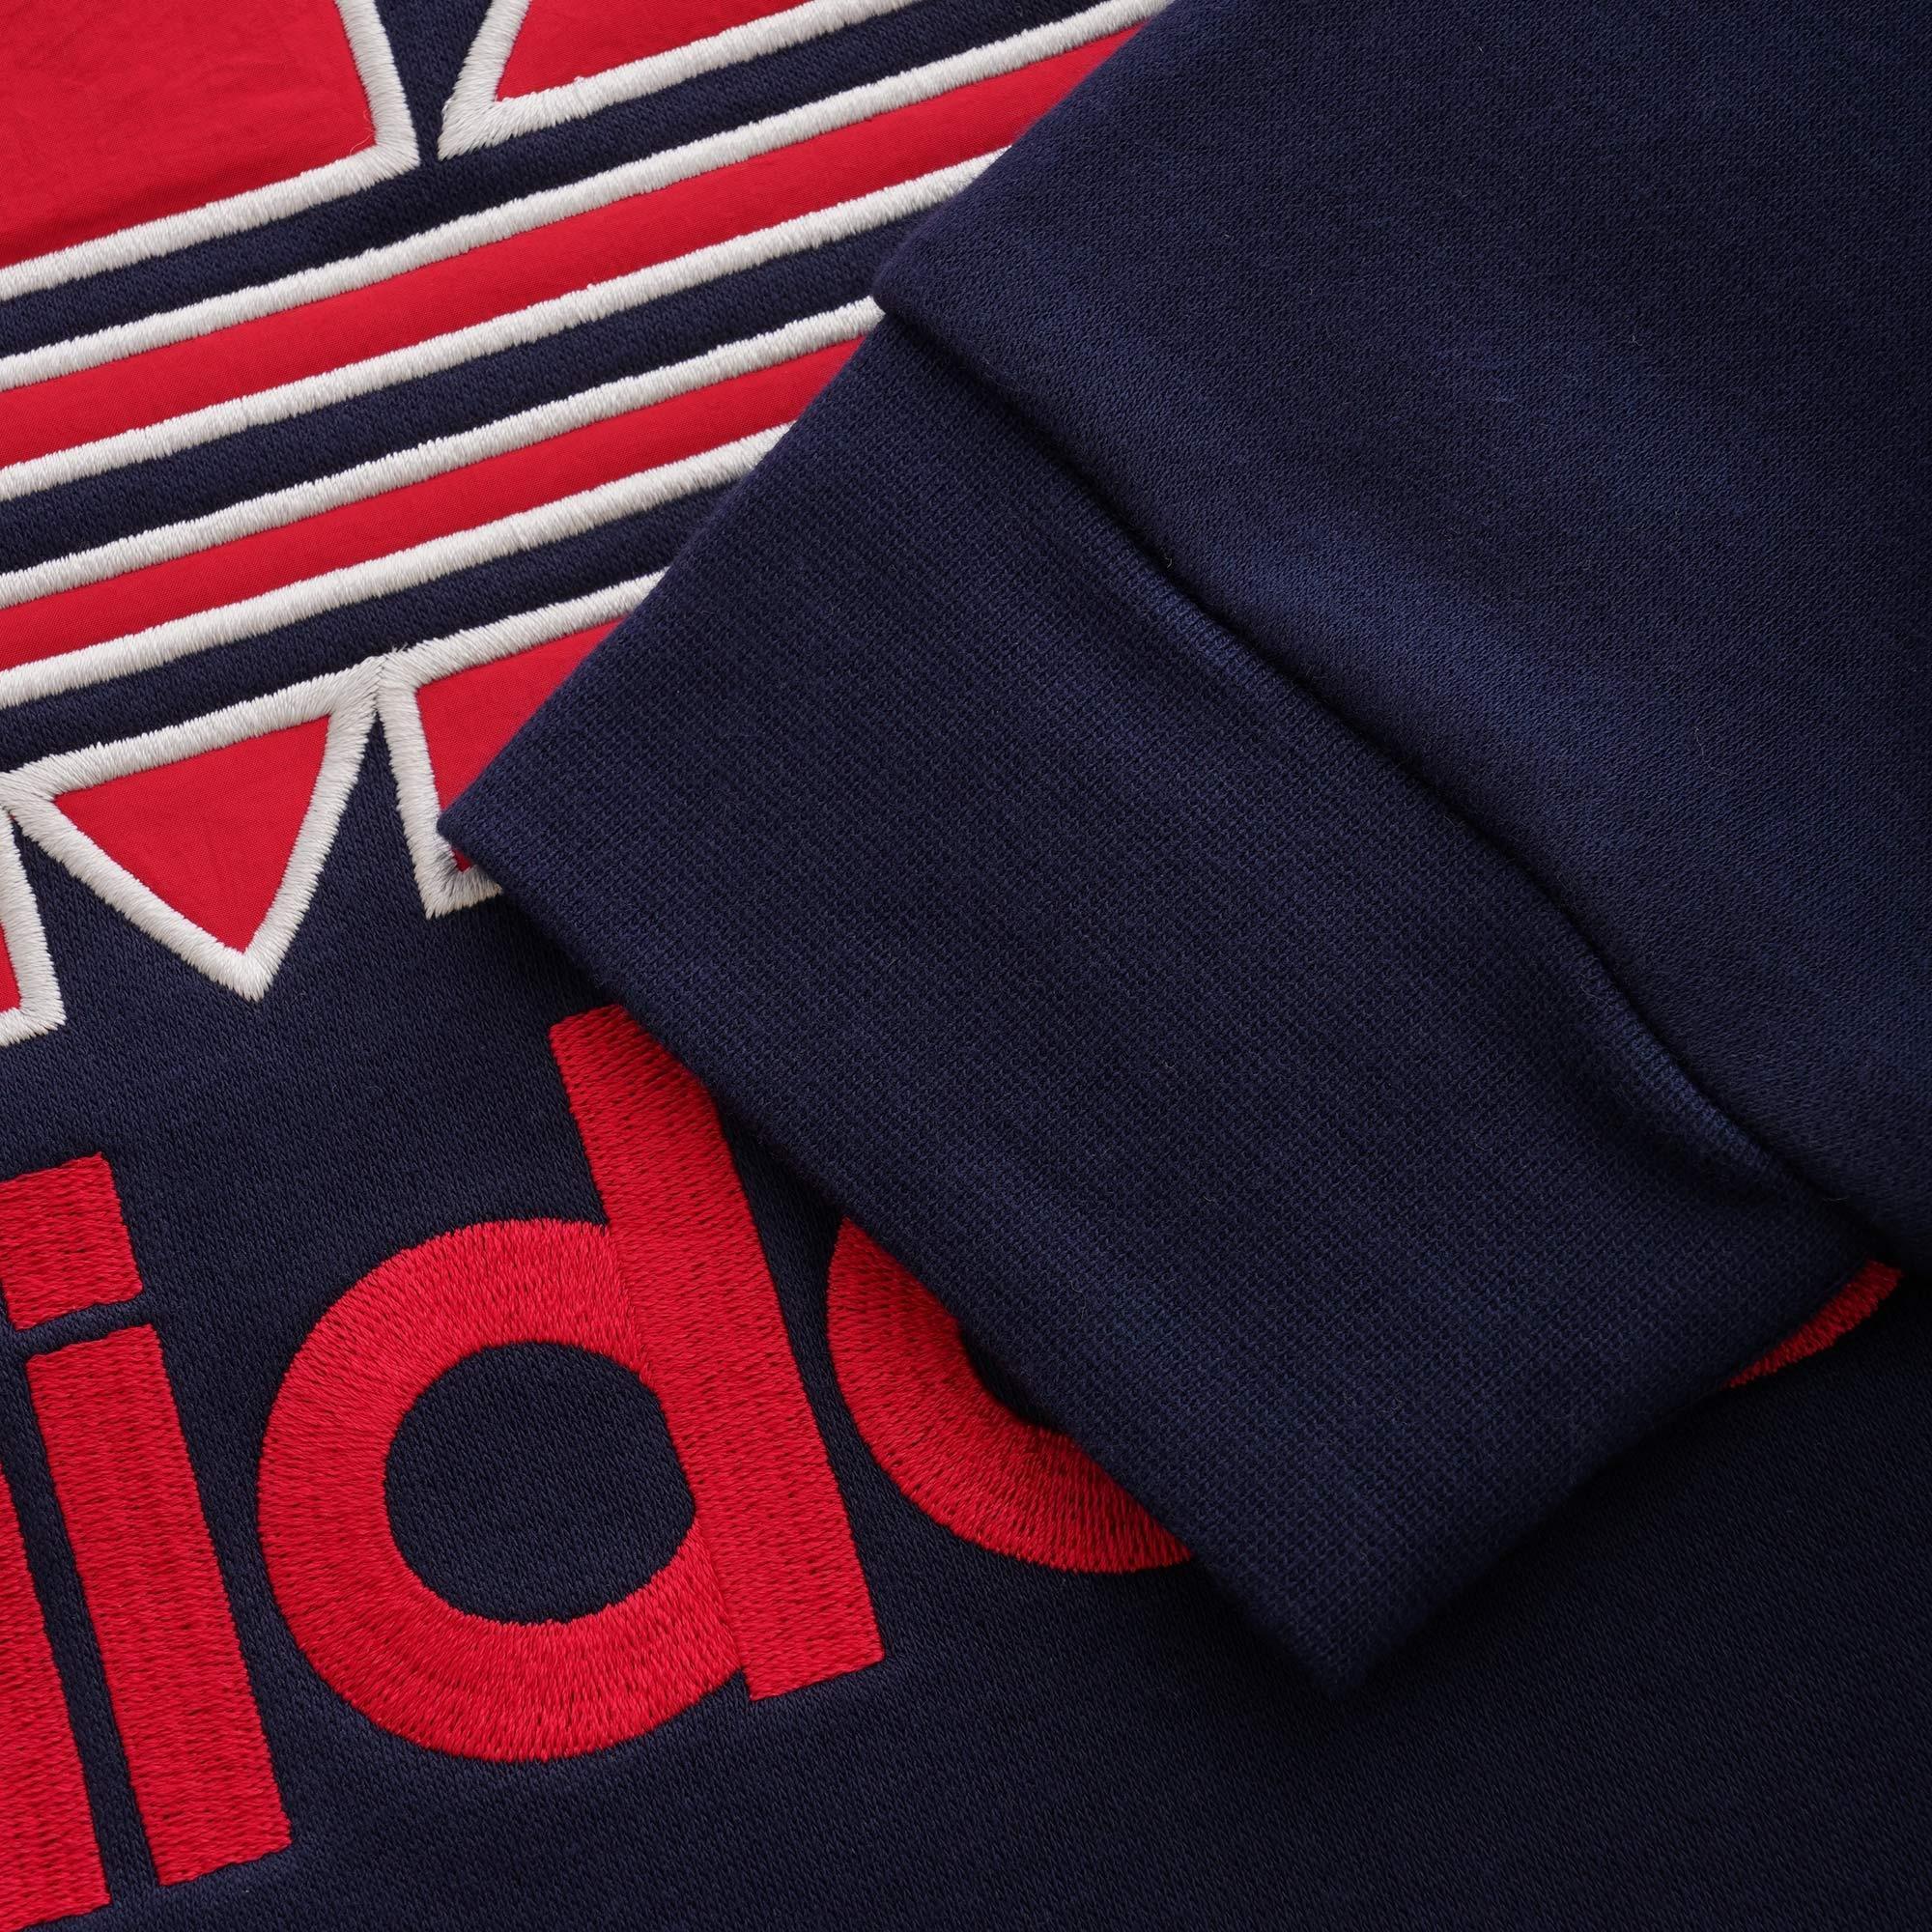 Lyst - adidas Originals Trefoil Crewneck Sweatshirt - Navy in Blue ... 6201246a4c2